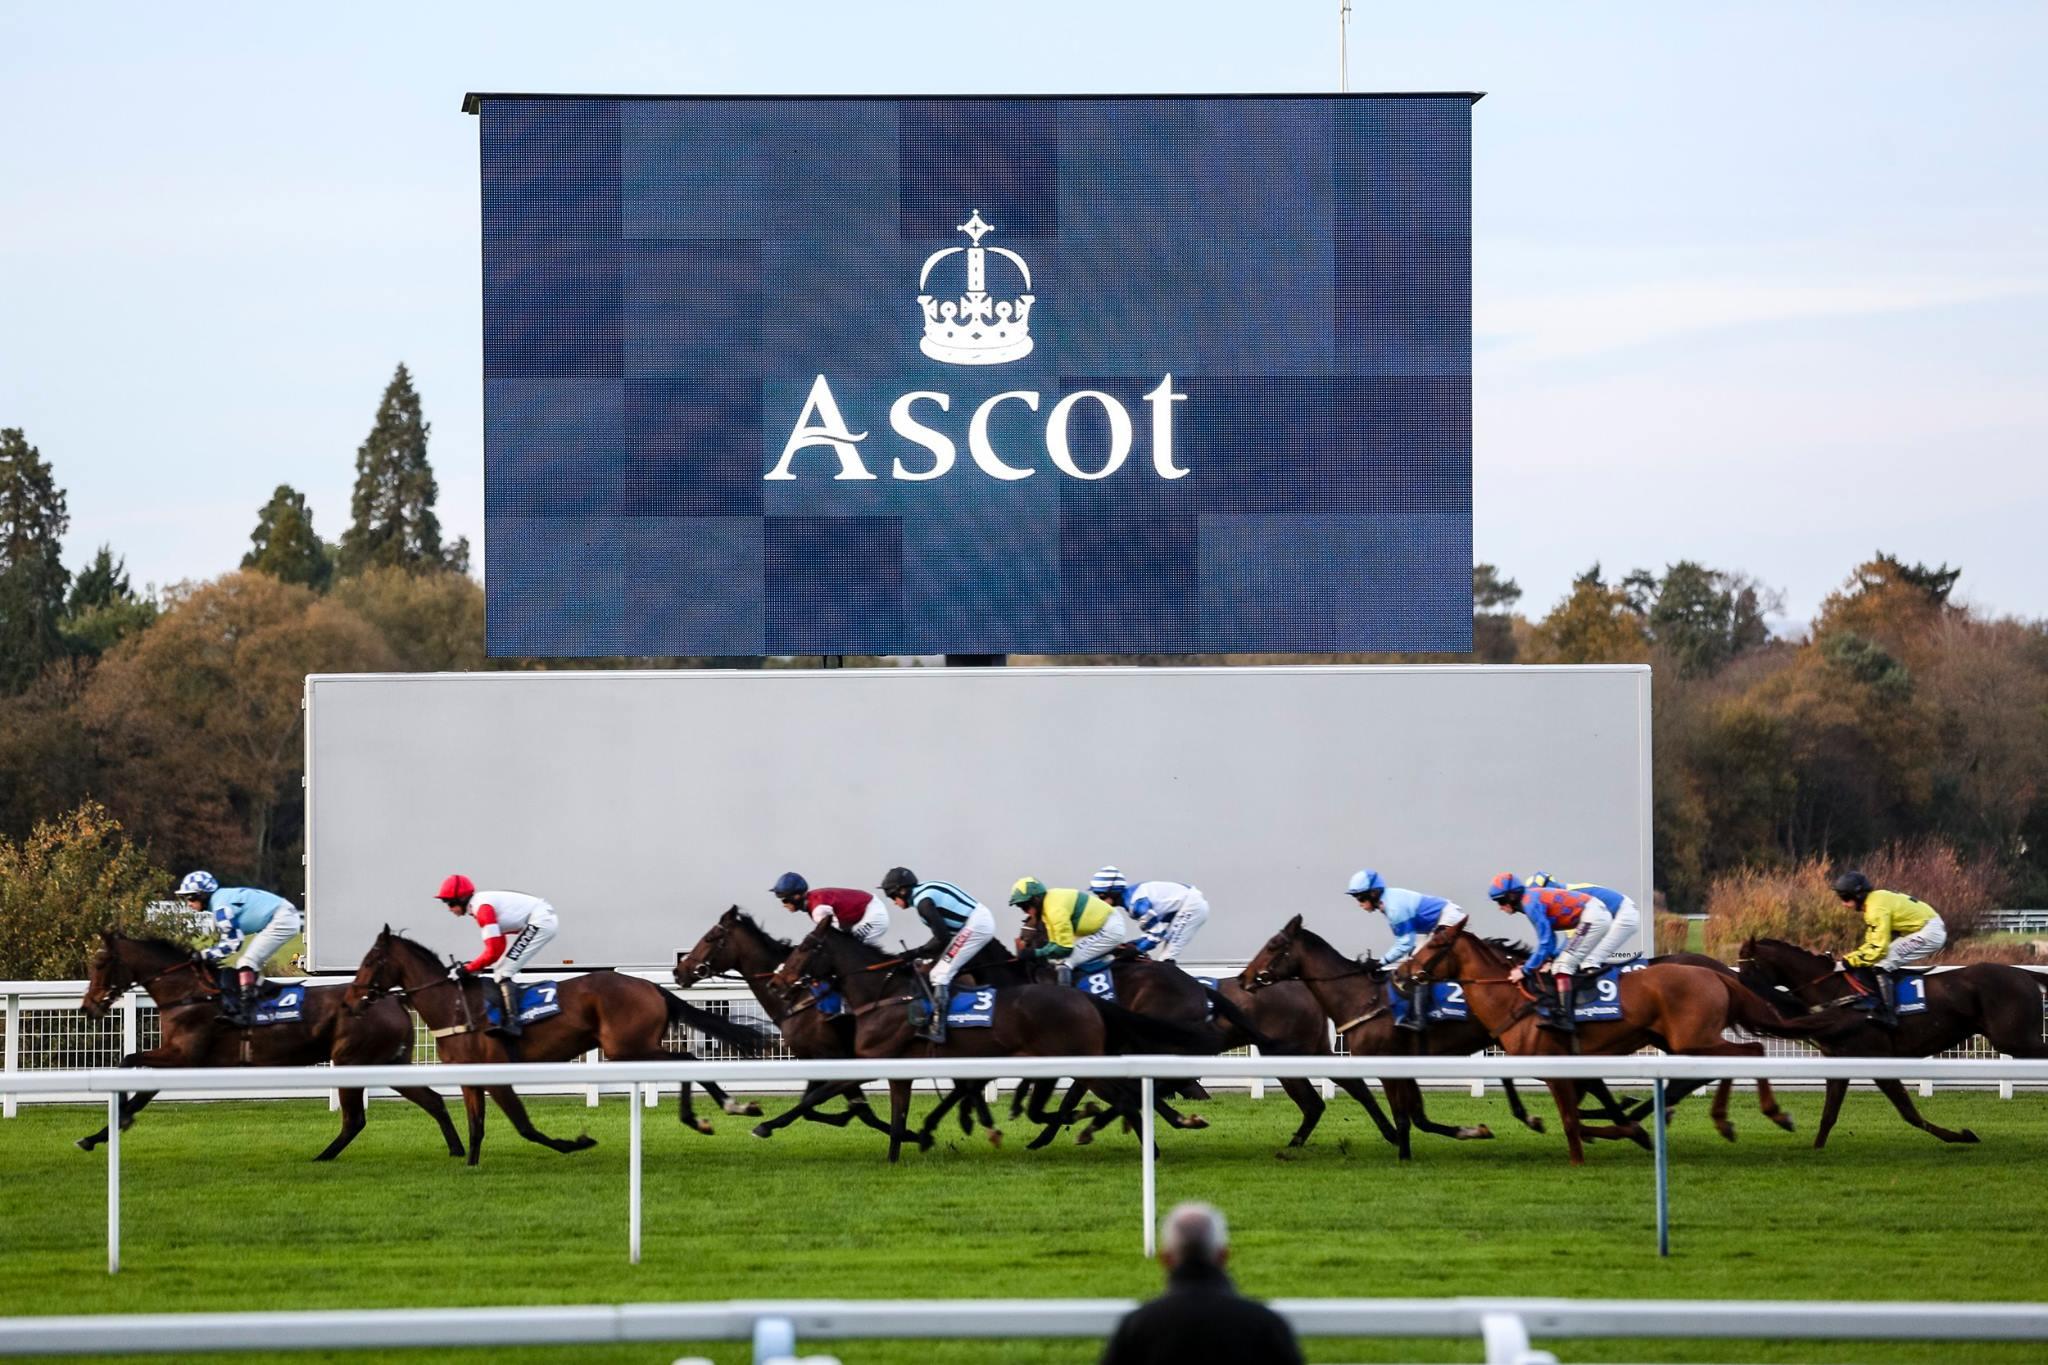 Copy of horses-racing.jpg